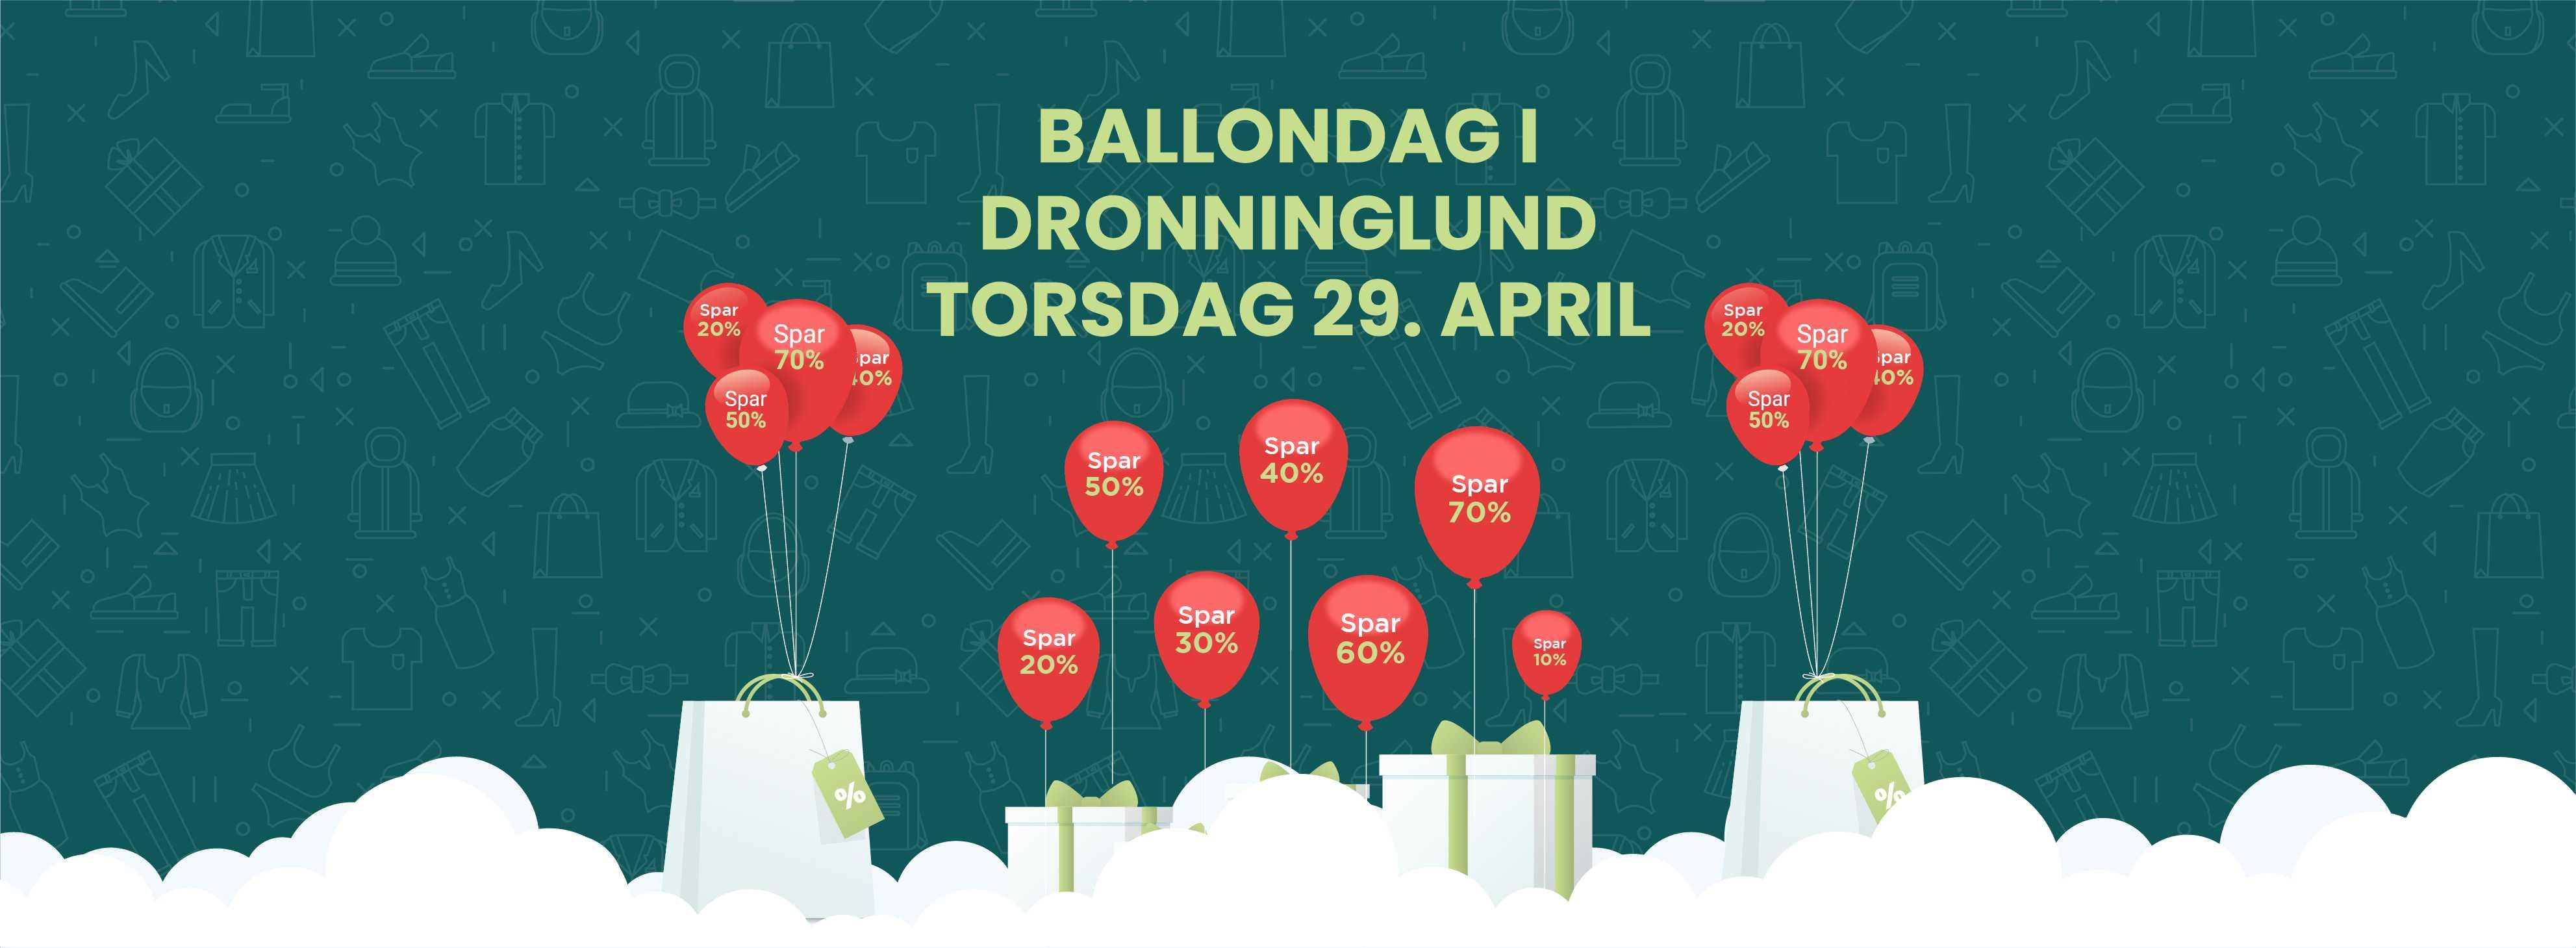 Ballon dag 29 april Ny 1 03 03